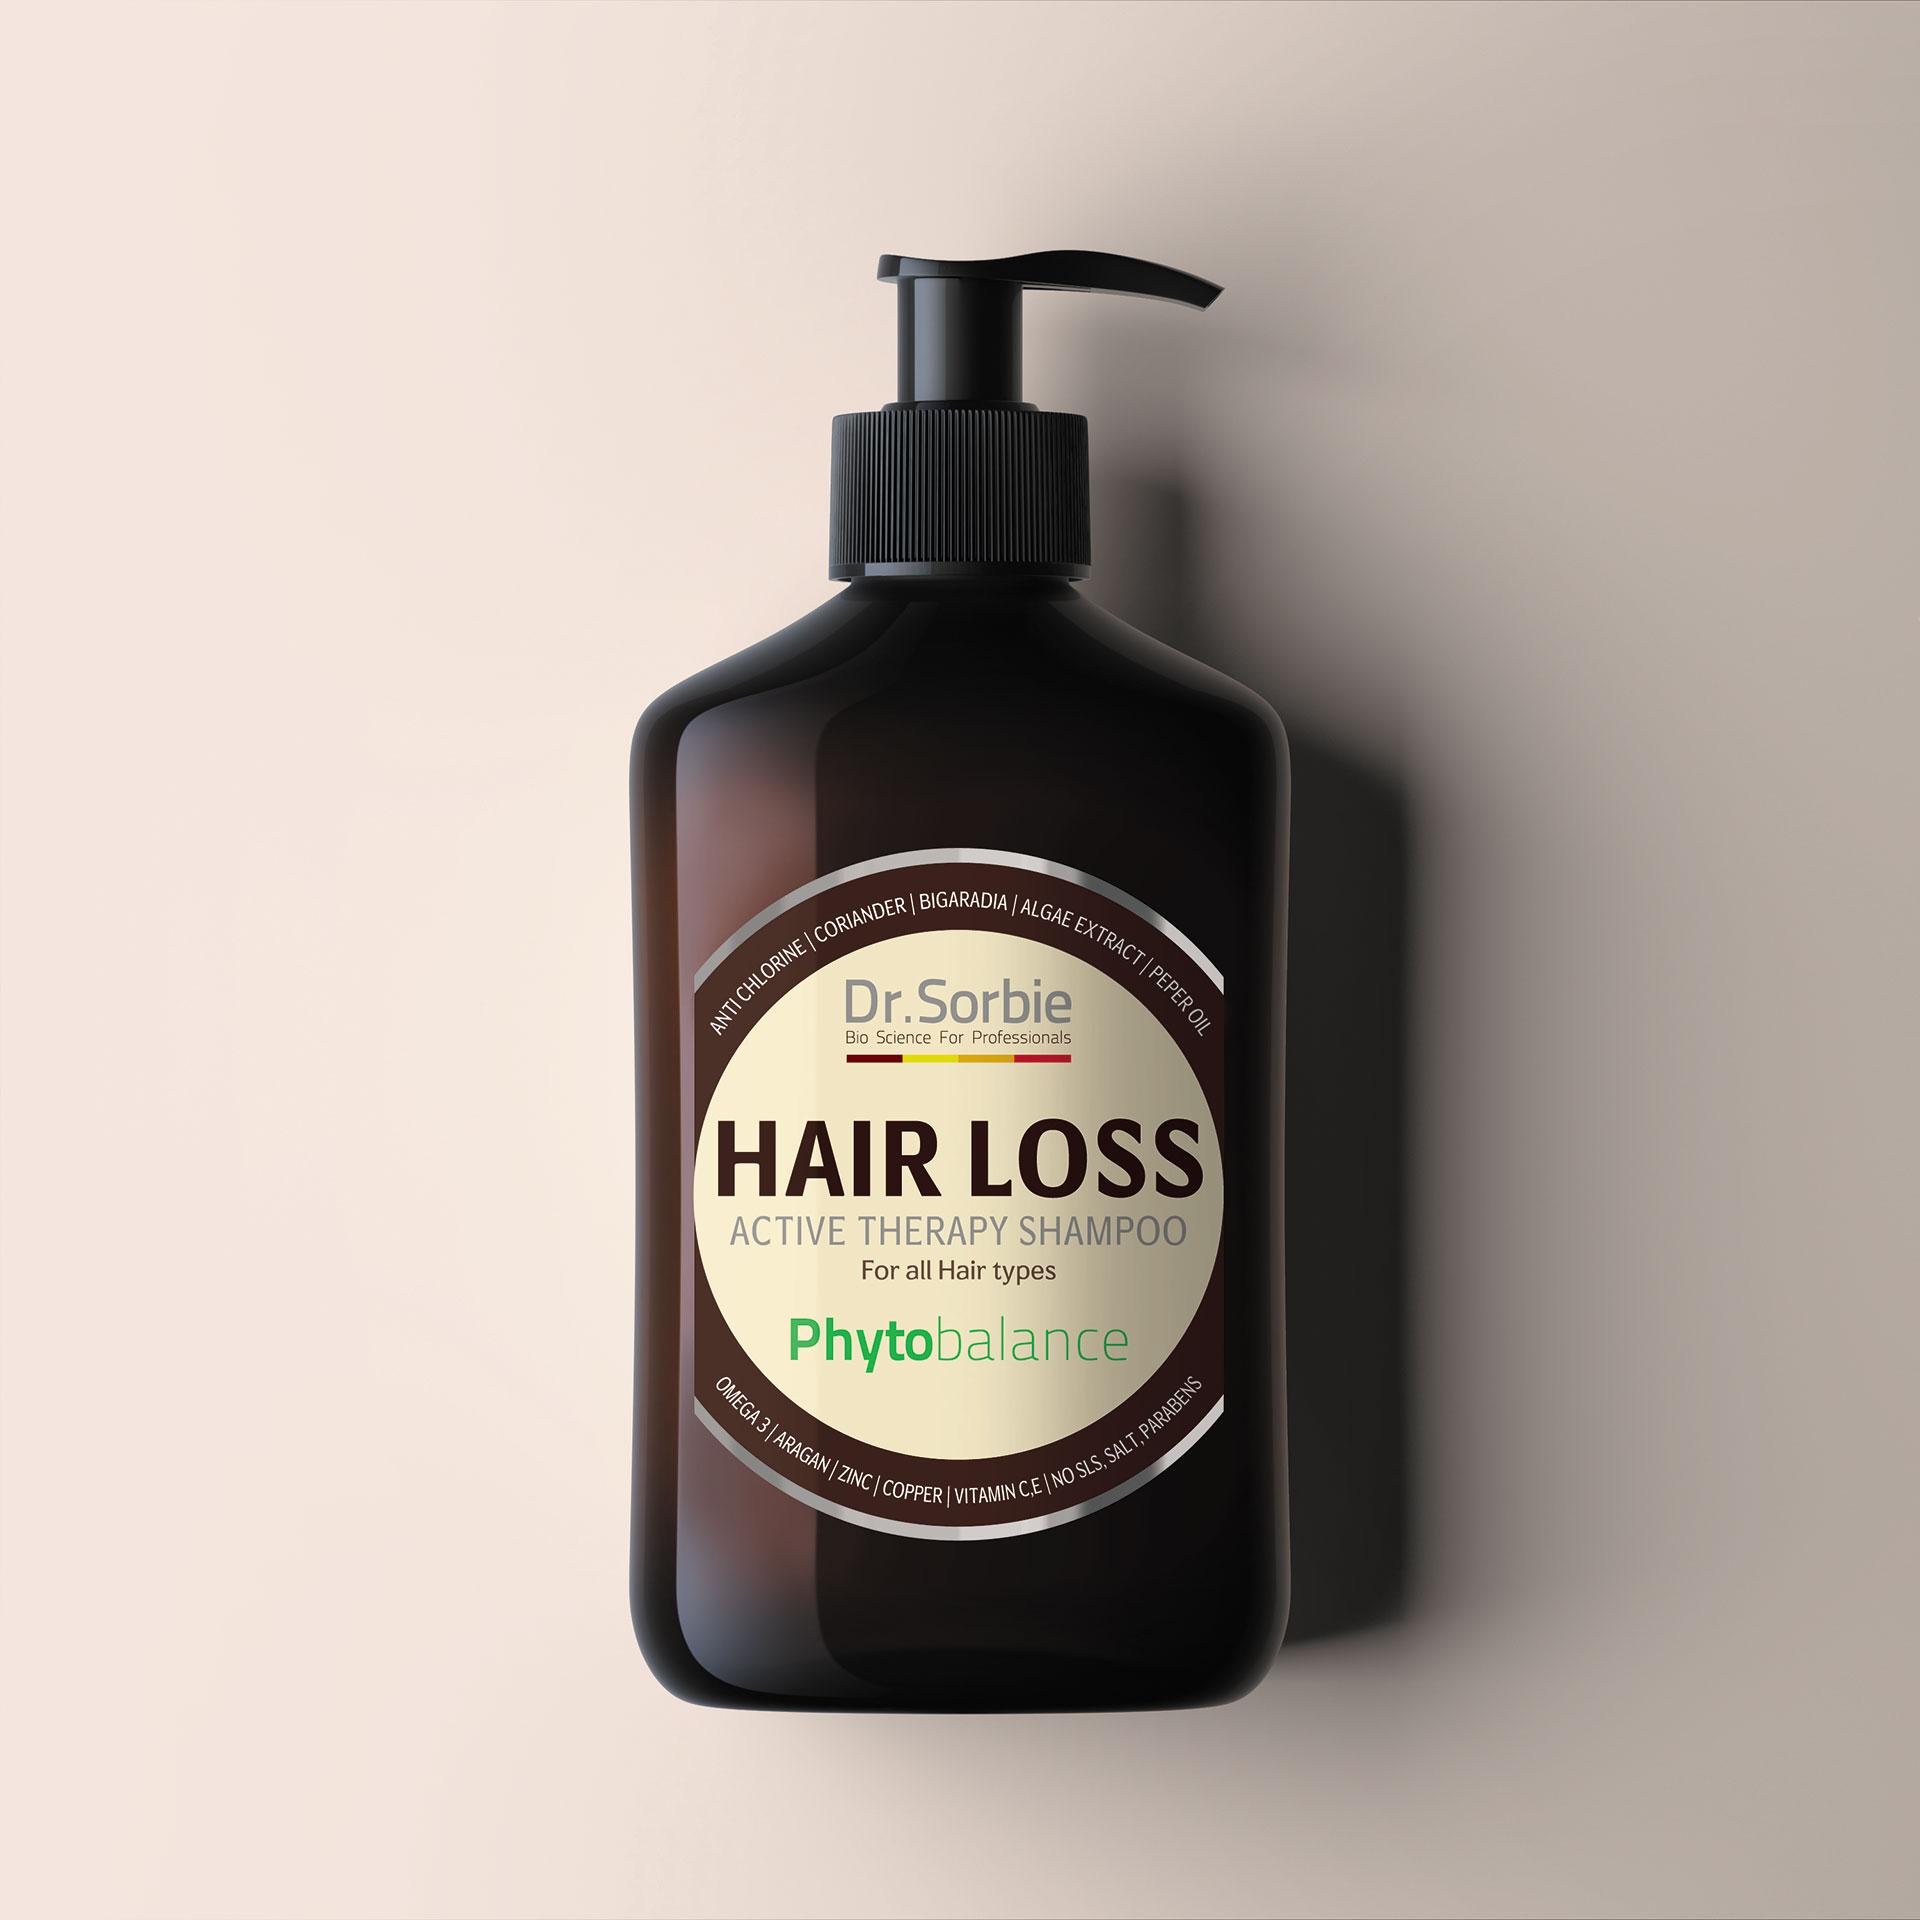 Hair loss-Shampoo by Dr. Sorbie